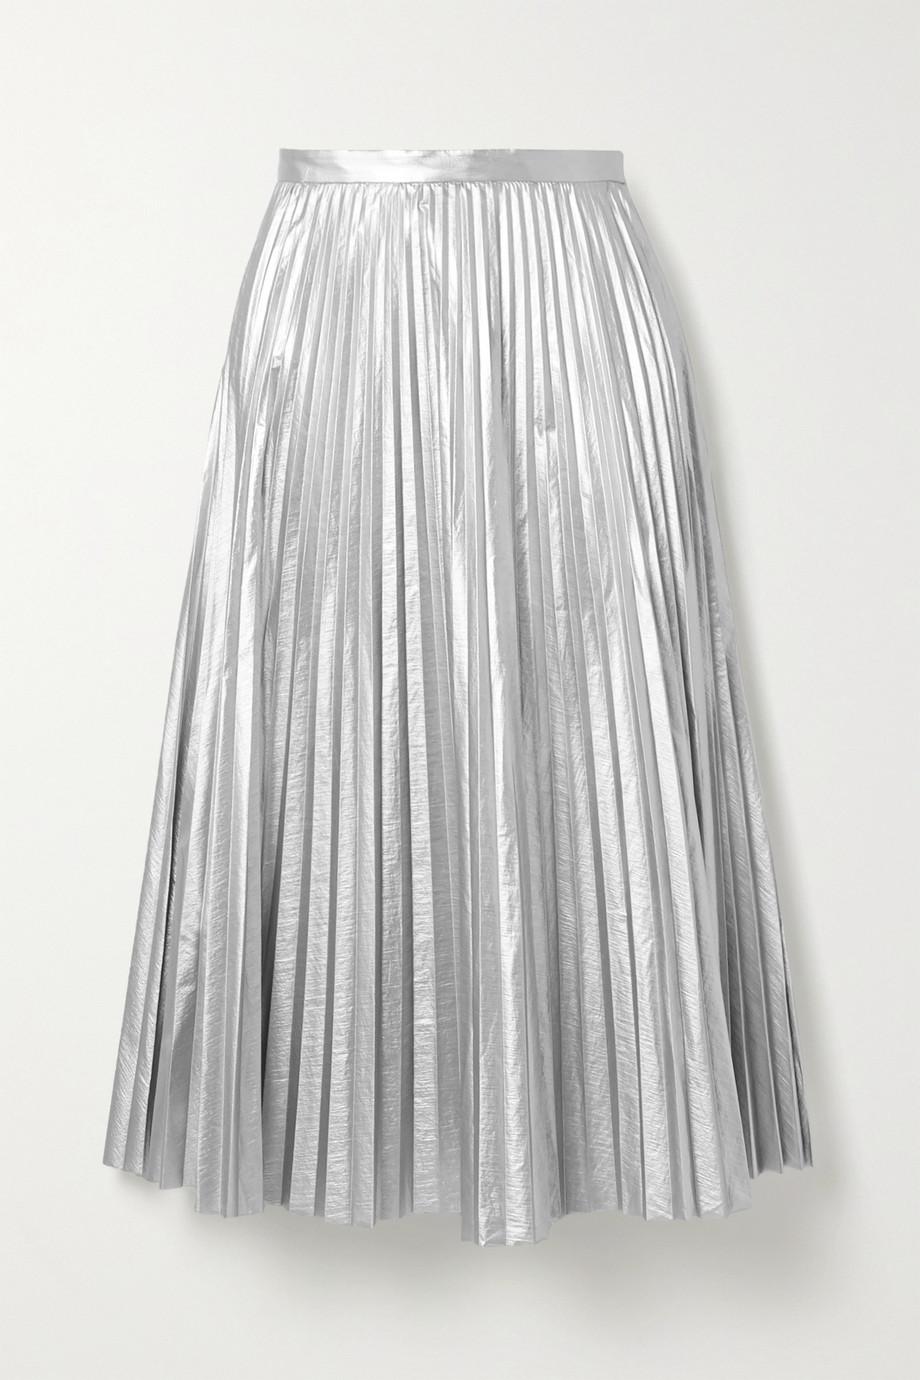 Tibi | Pleated metallic shell midi skirt | NET-A-PORTER.COM